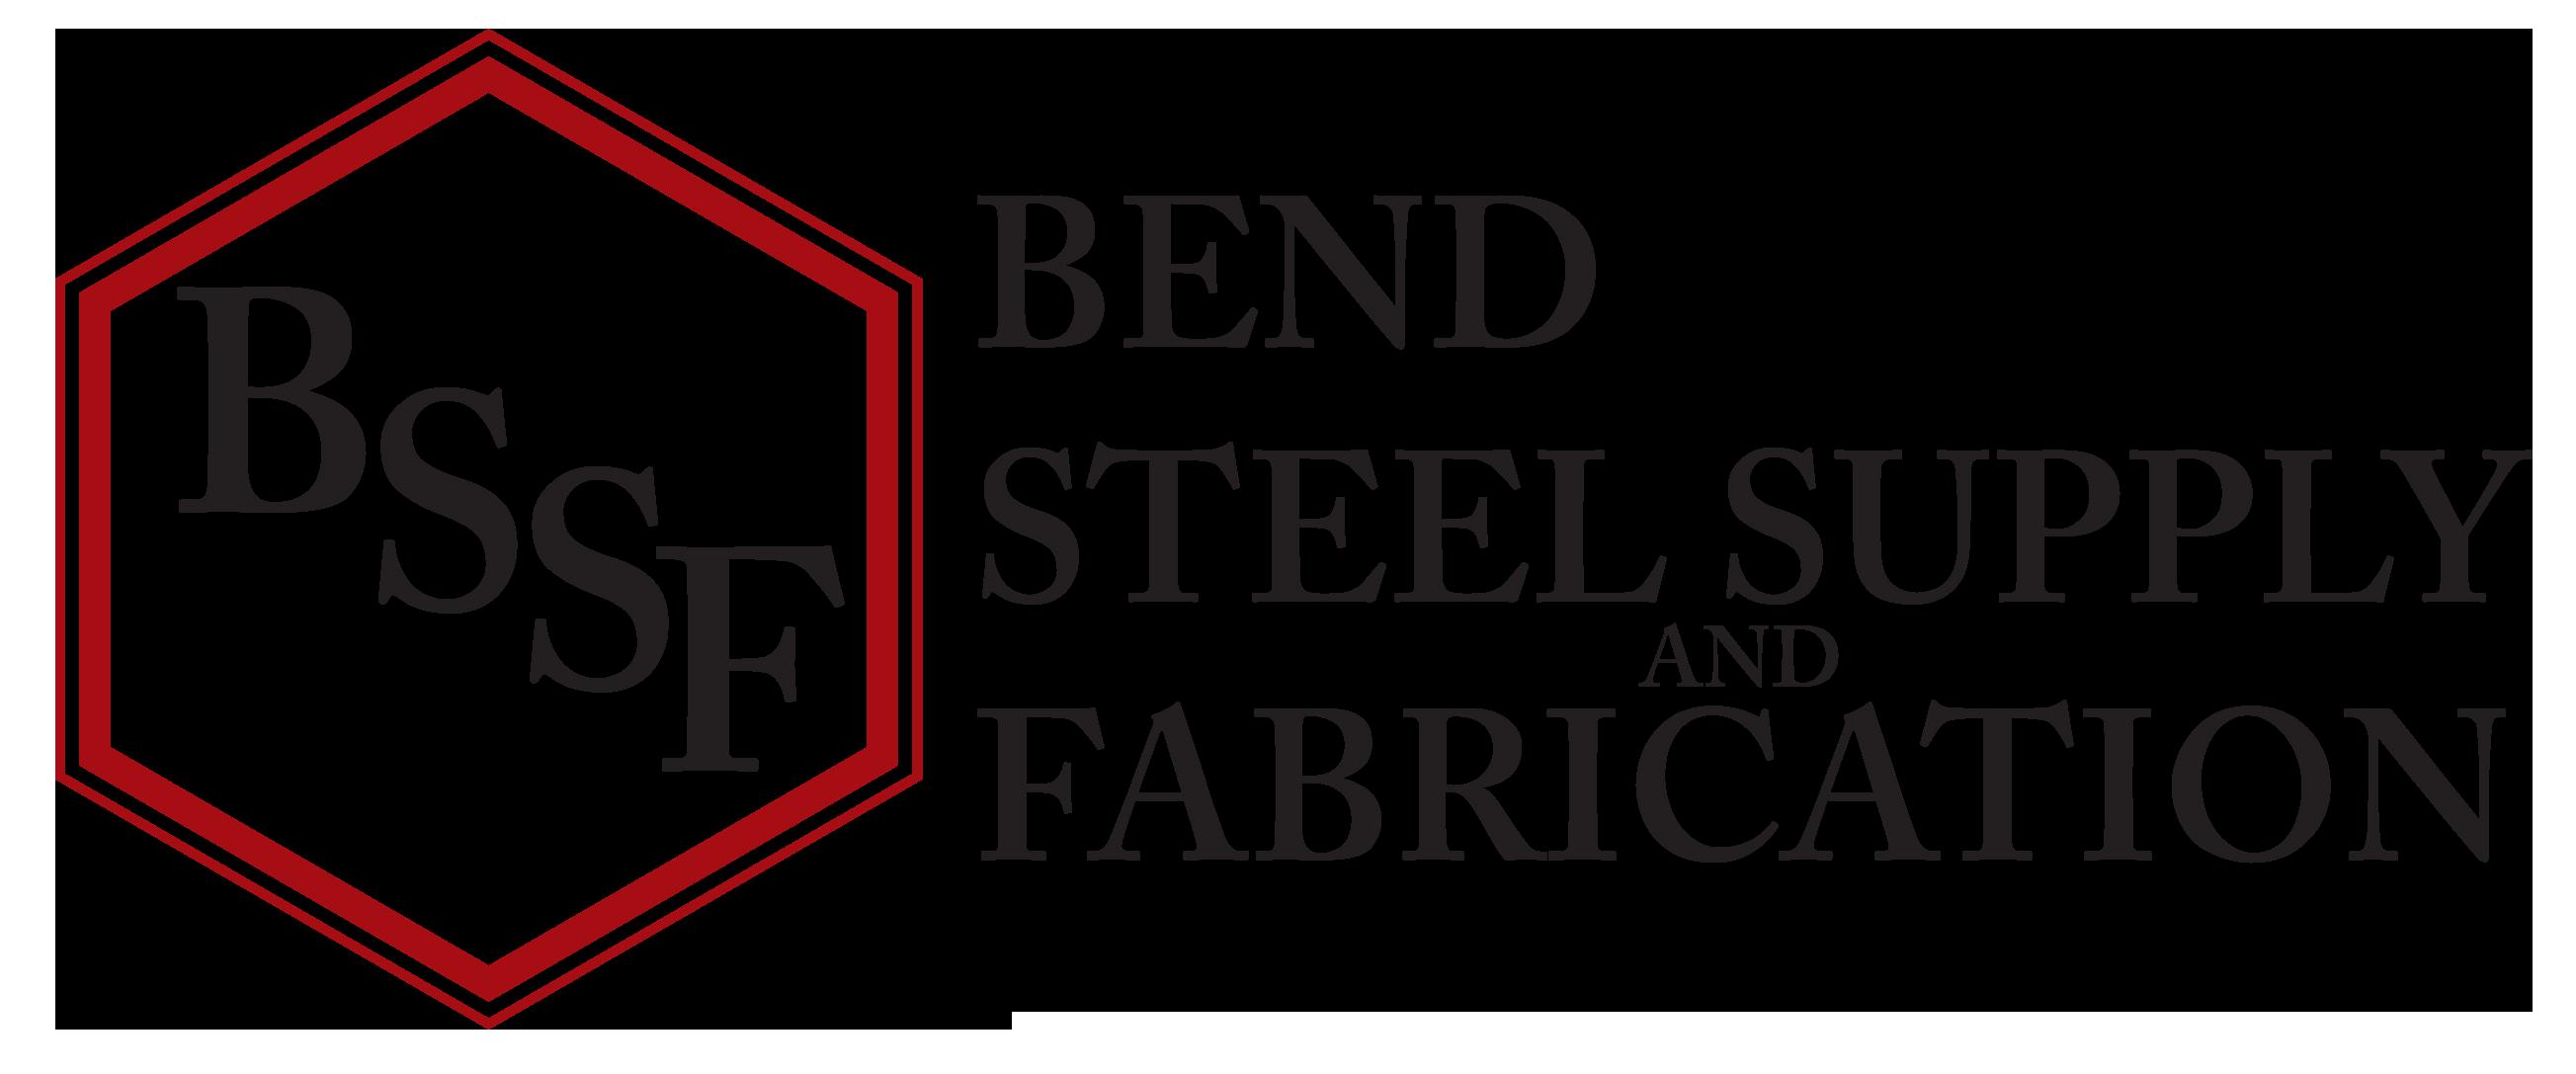 Bend Steel Supply & Fabrication